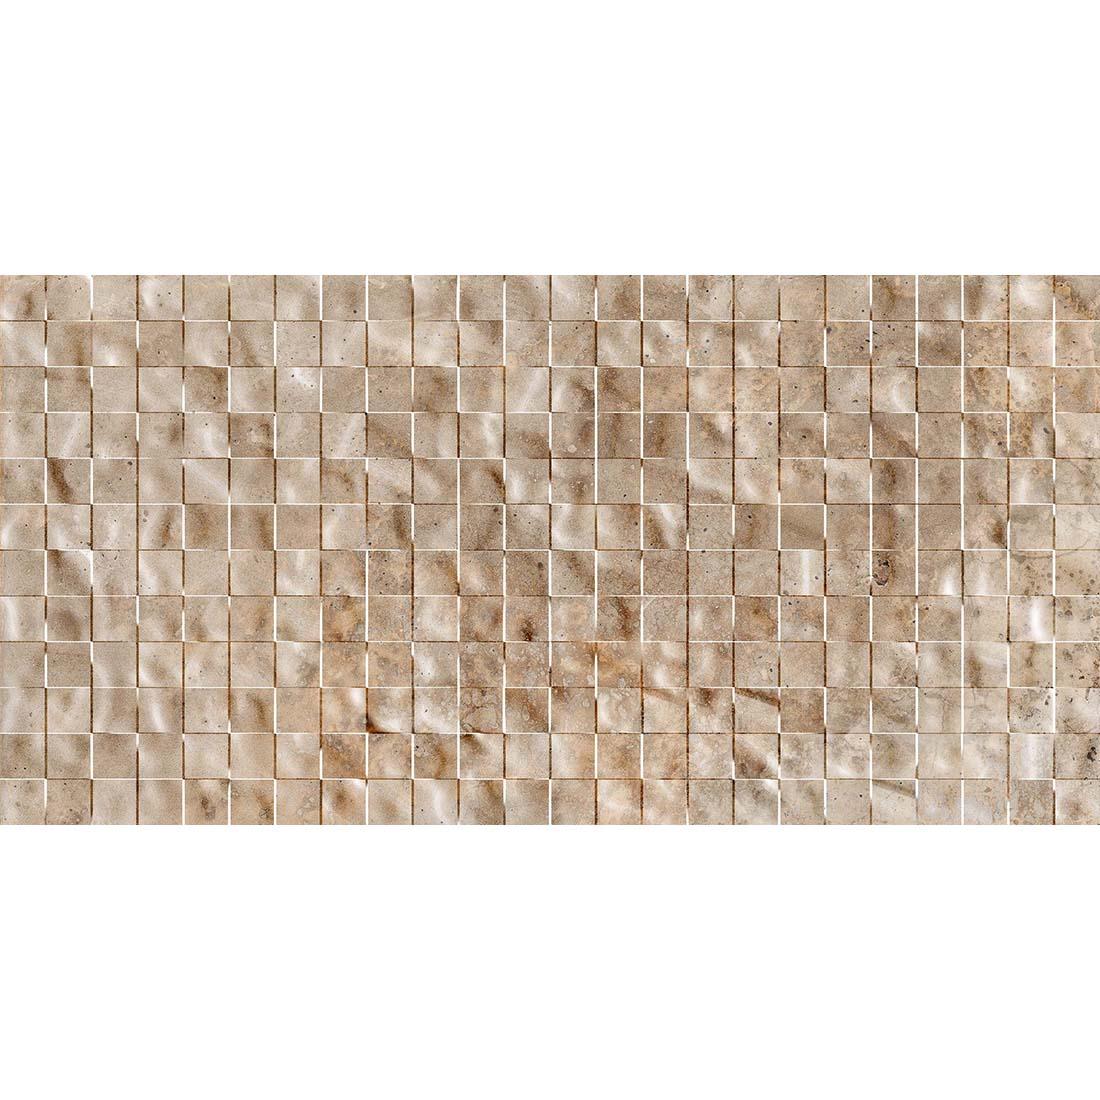 Roma Stonex Decor 30x60 Beige Gloss 1